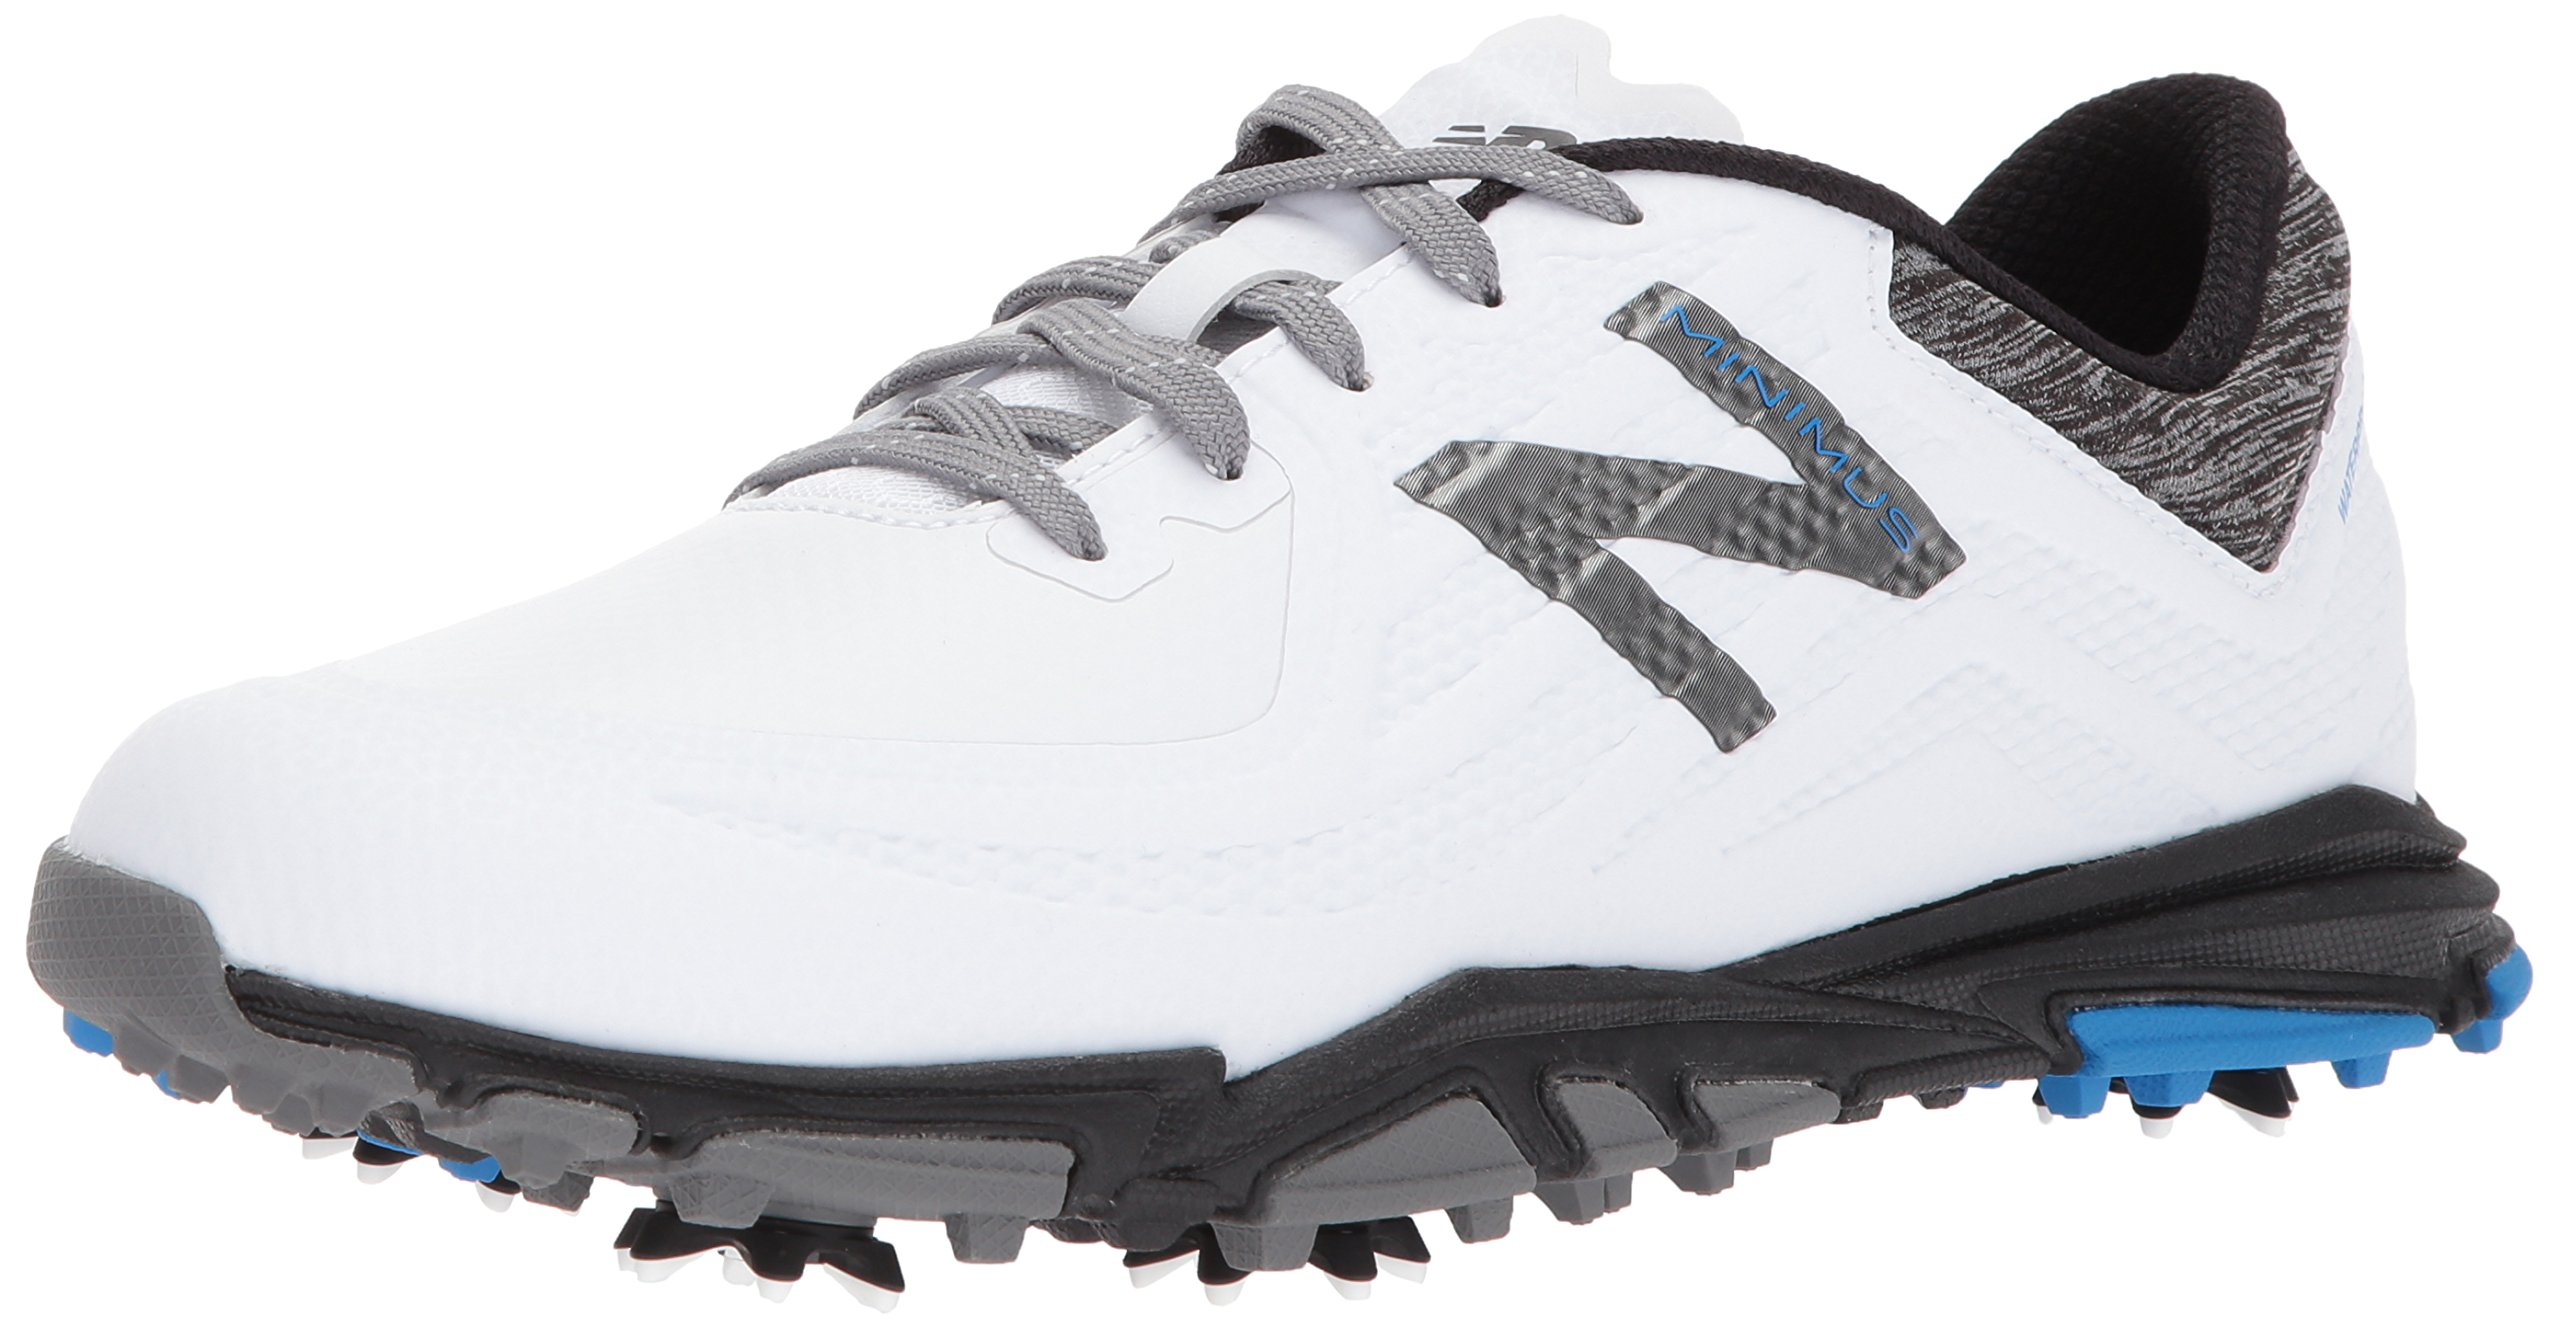 New Balance Men's Minimus Tour Golf Shoe, White/Black, 12 2E 2E US